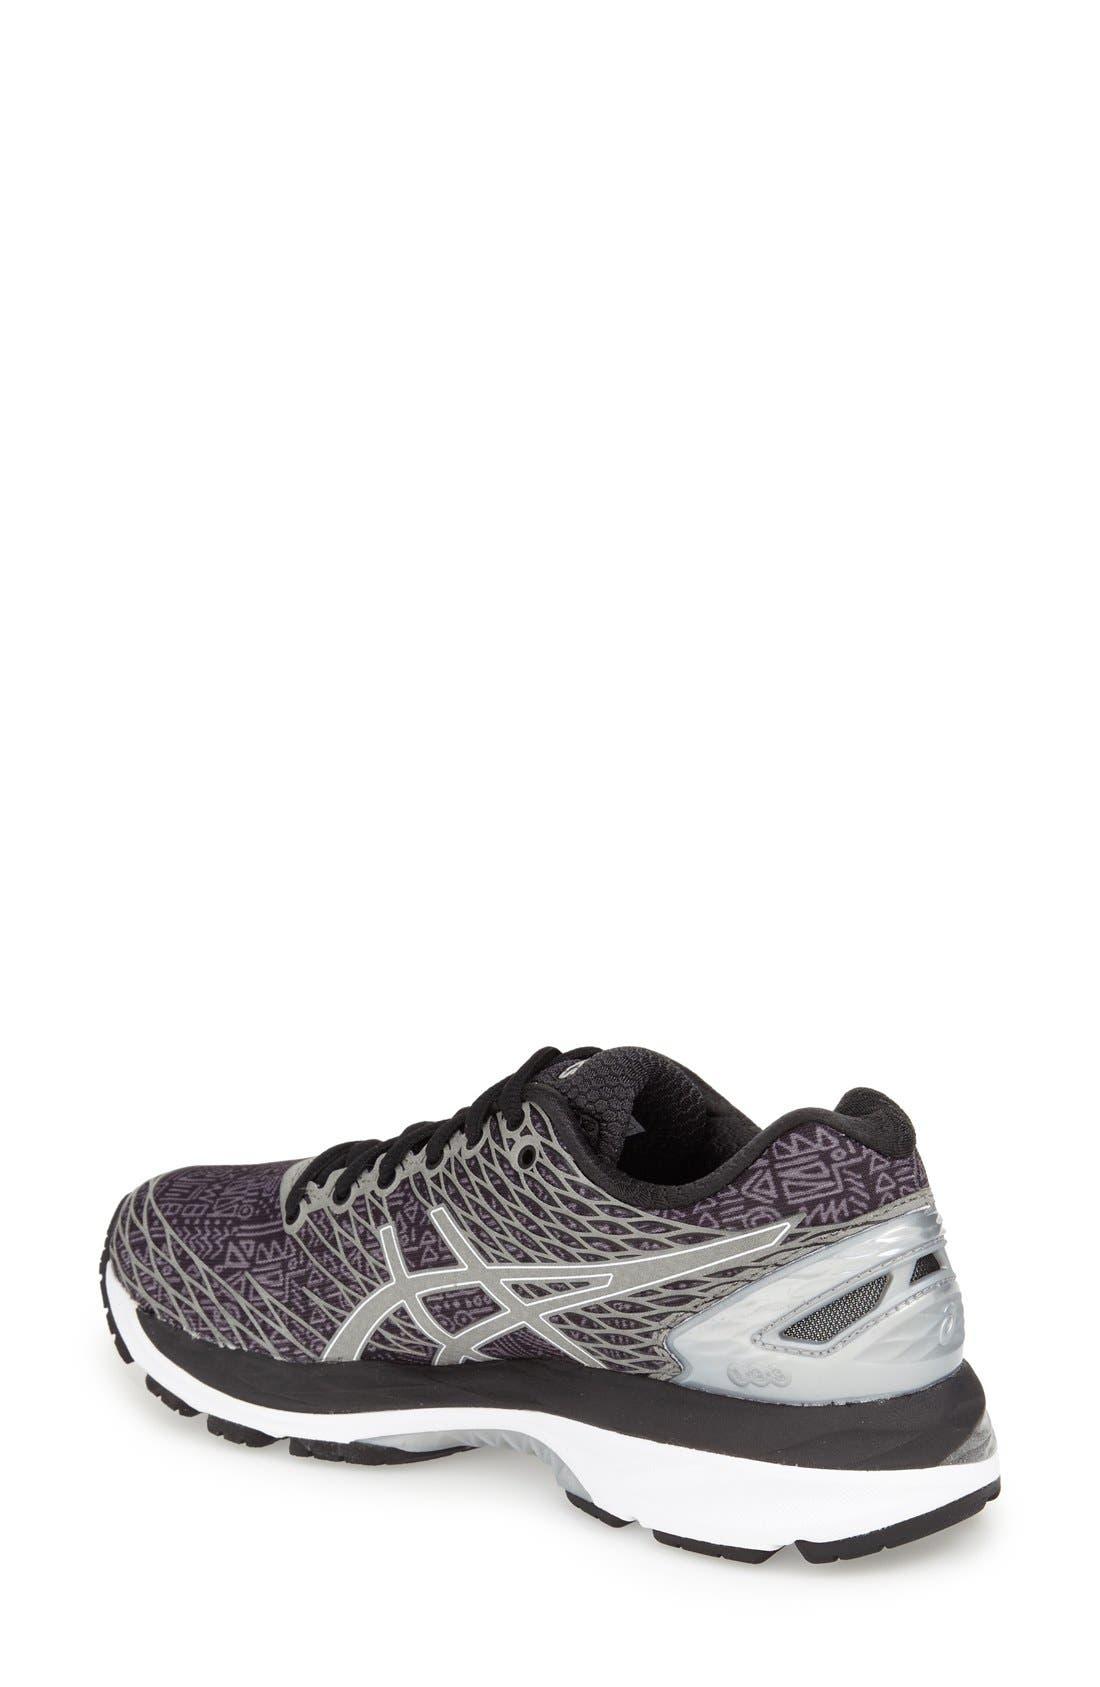 ASICS<SUP>®</SUP>,                             'GEL-Nimbus 18 Lite-Show' Running Shoe,                             Alternate thumbnail 2, color,                             003